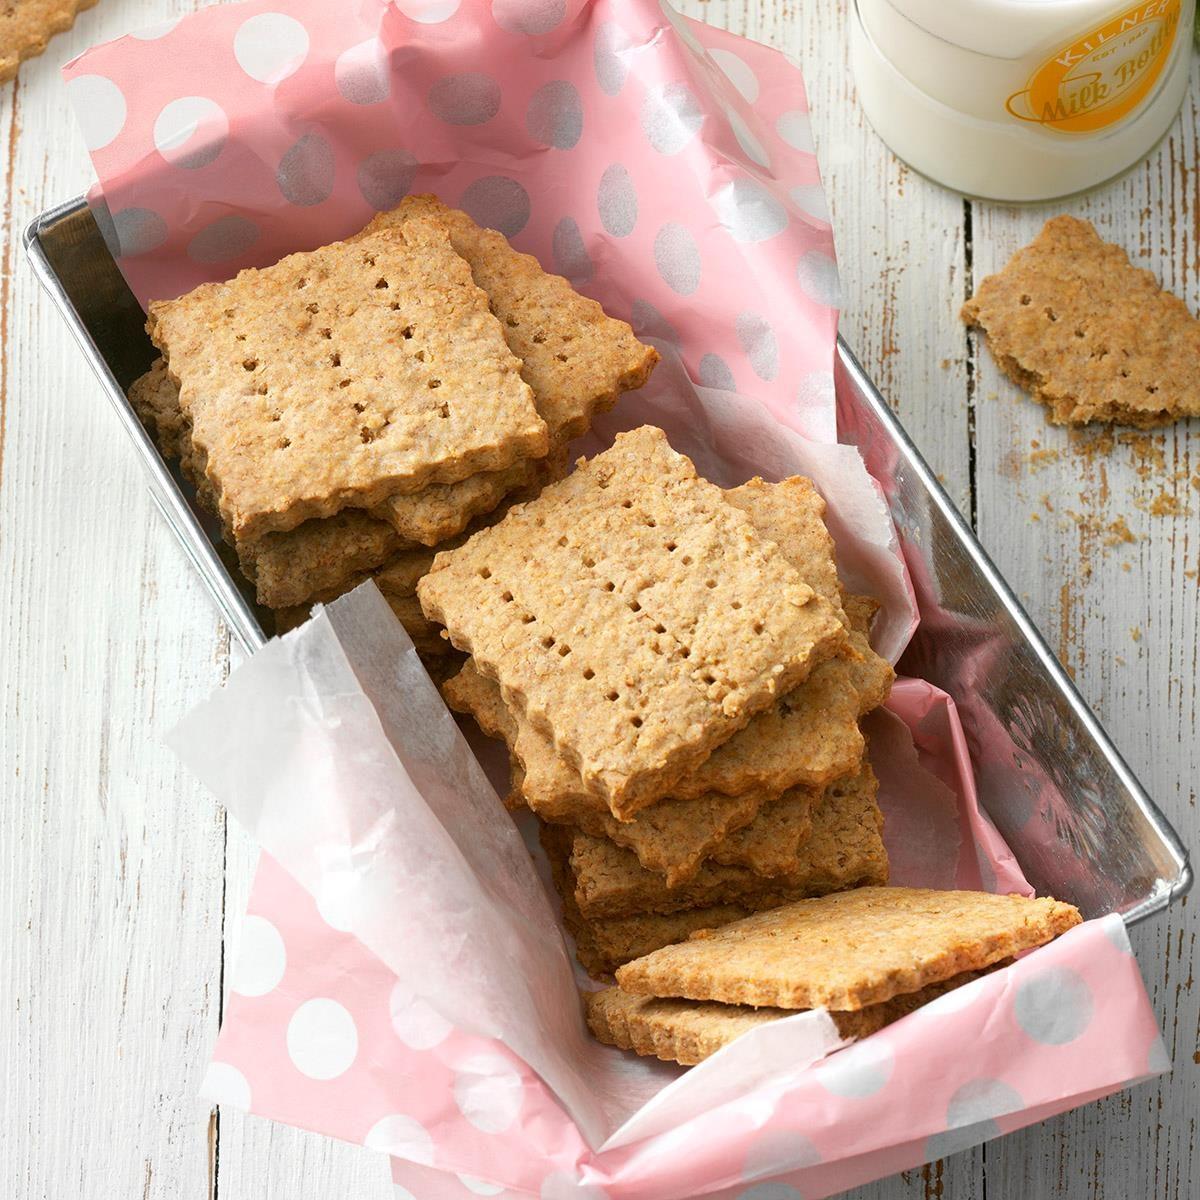 Inspired By: Honey Maid Graham Crackers